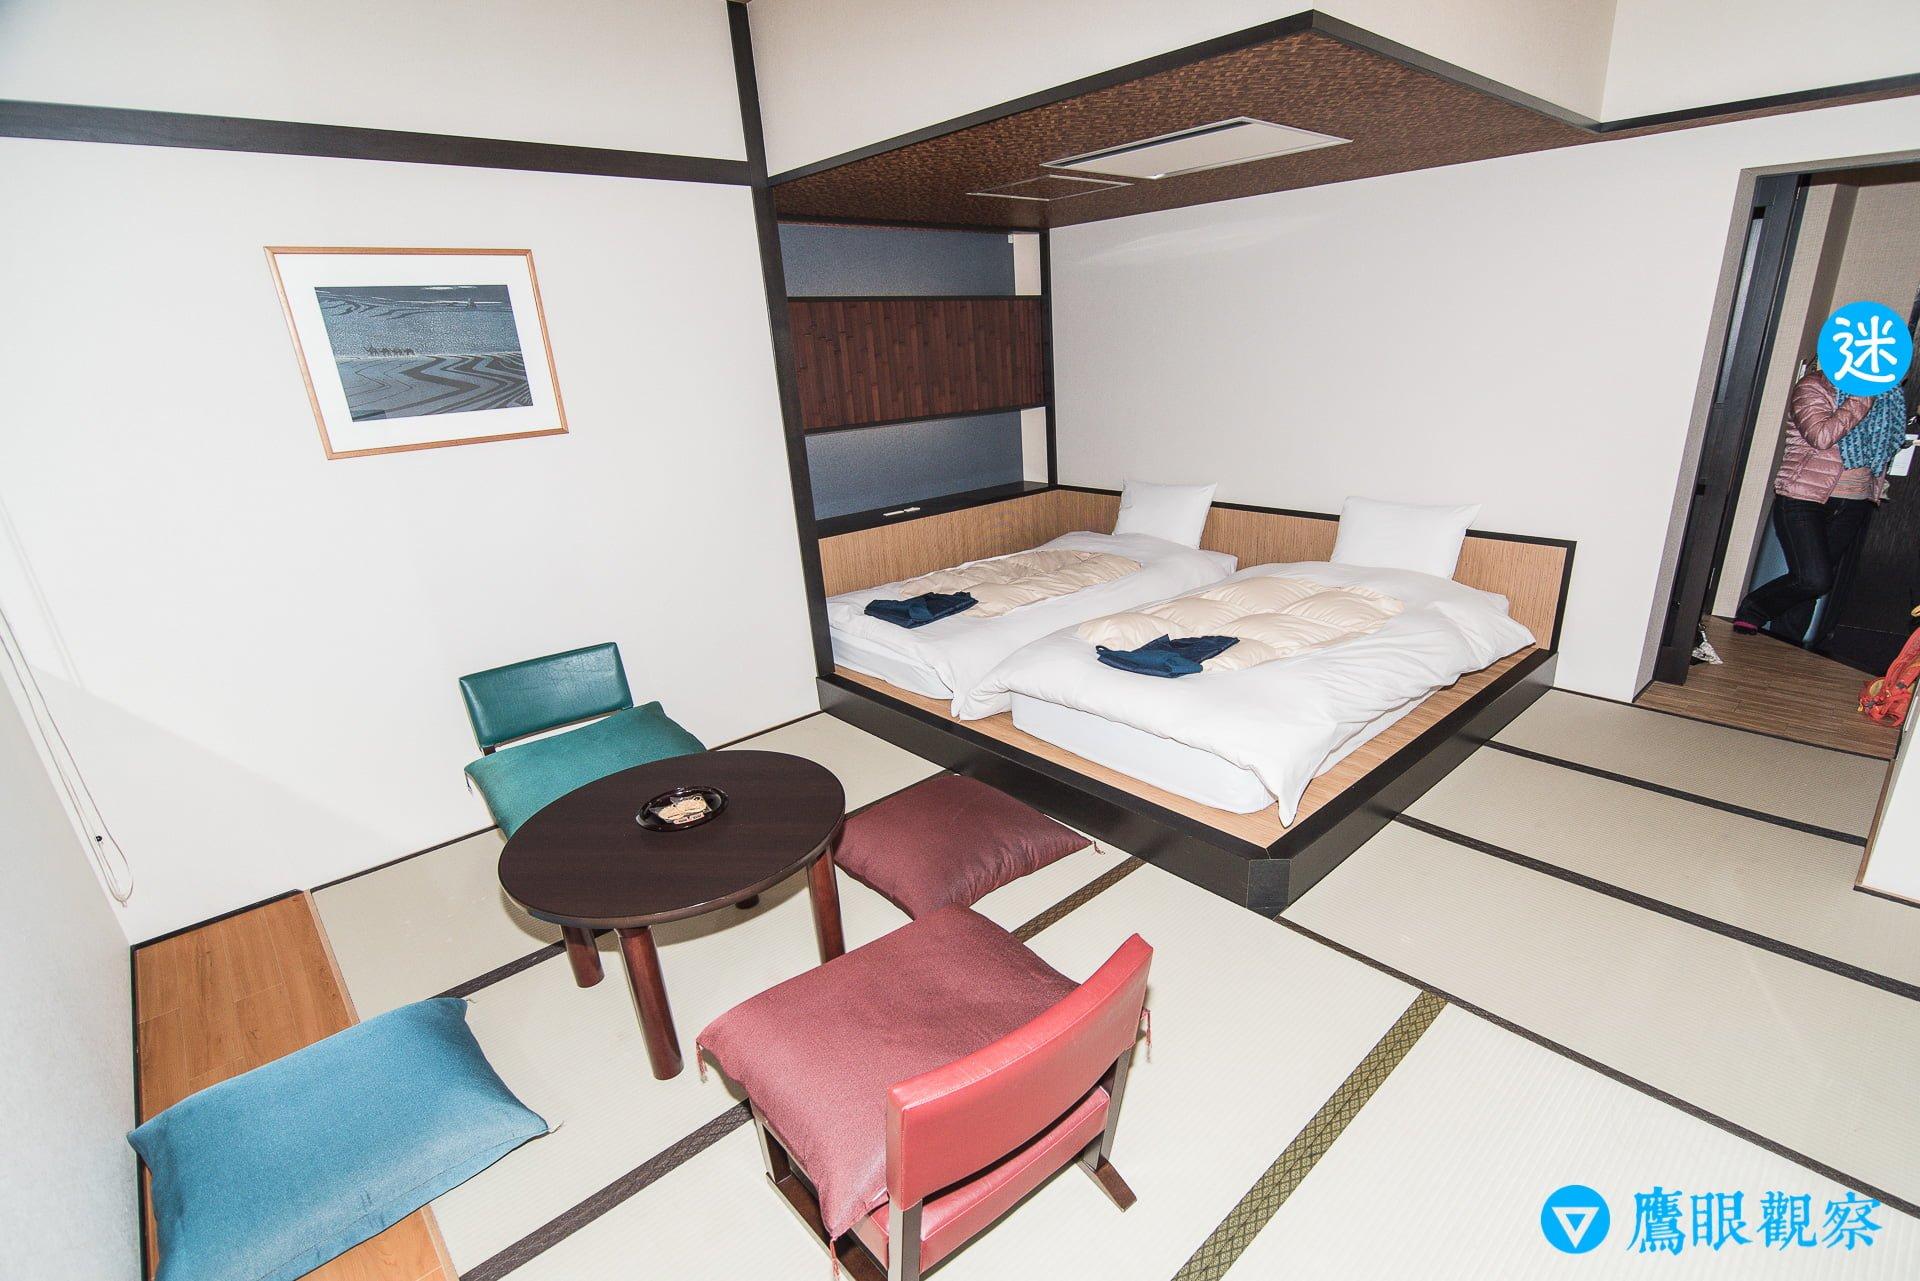 Travel Oarai Hotel in Ibaraki Prefecture Japan 54 日本茨城縣/東茨城/大洗飯店(大洗ホテル)/旅館推薦與住宿旅遊心得分享